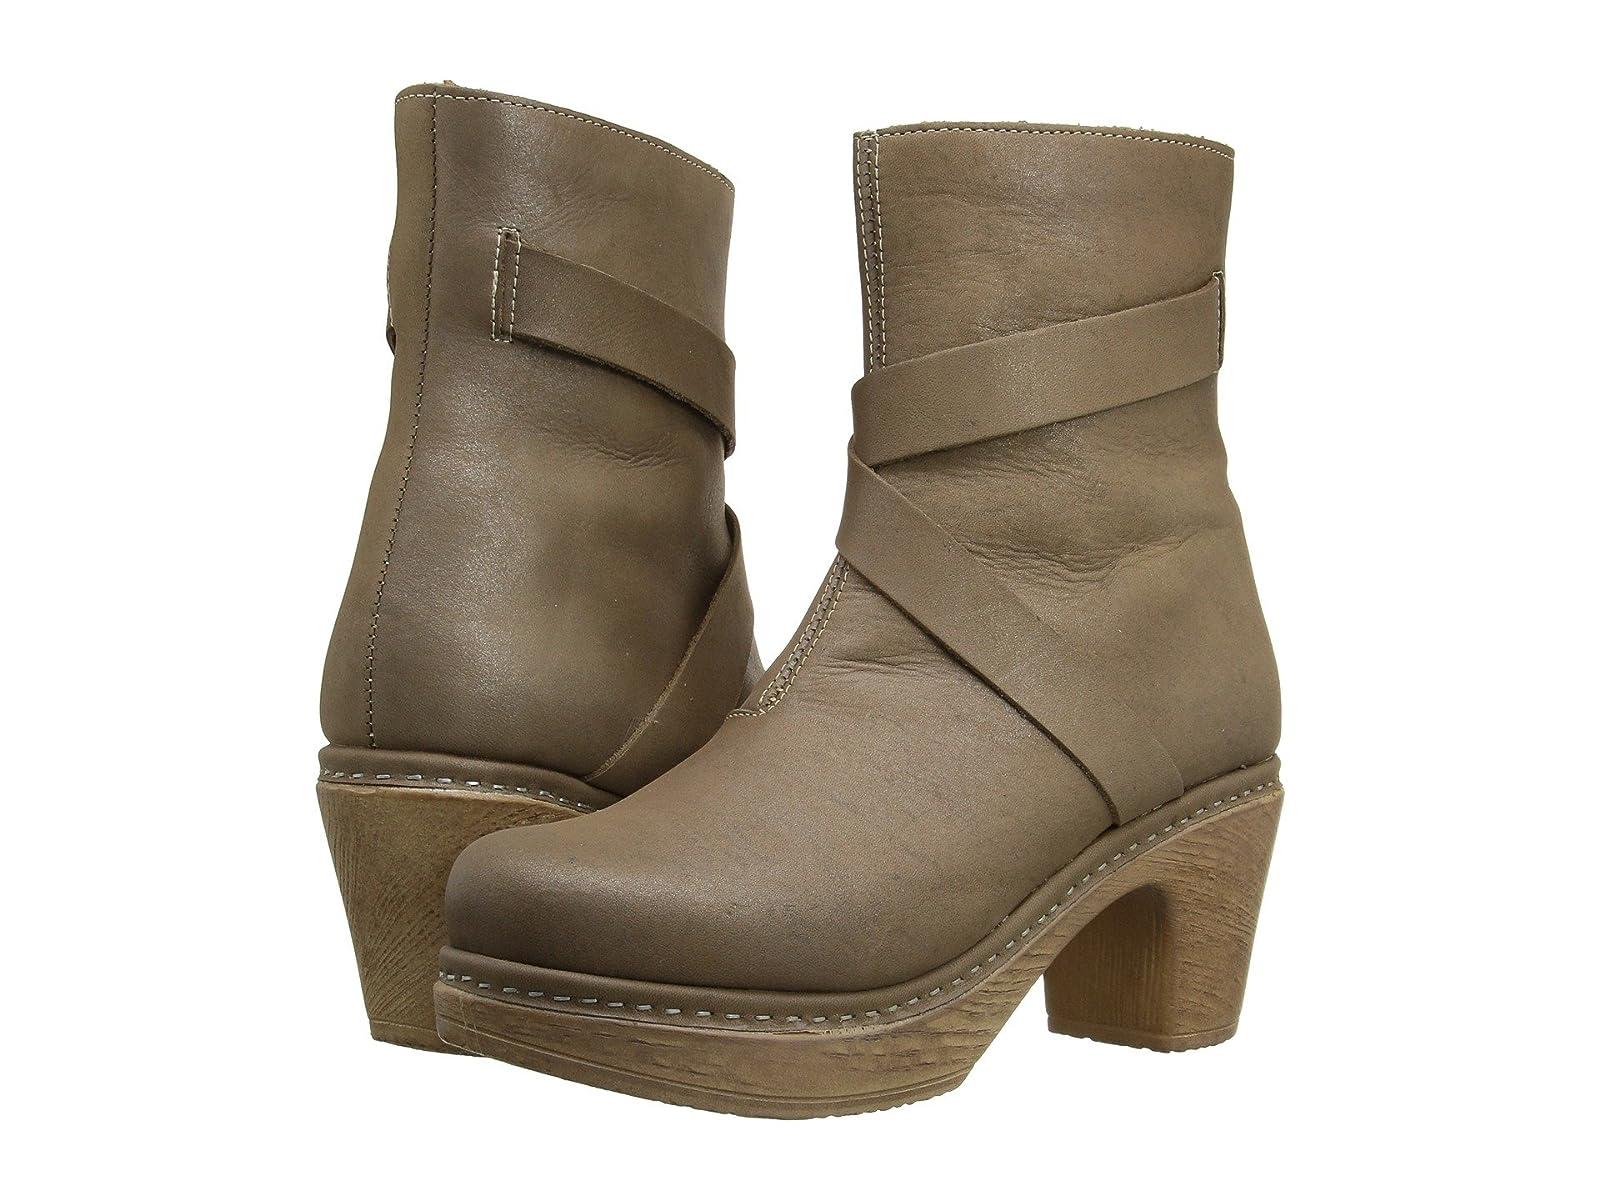 Calou Stockholm Julia 2Cheap and distinctive eye-catching shoes